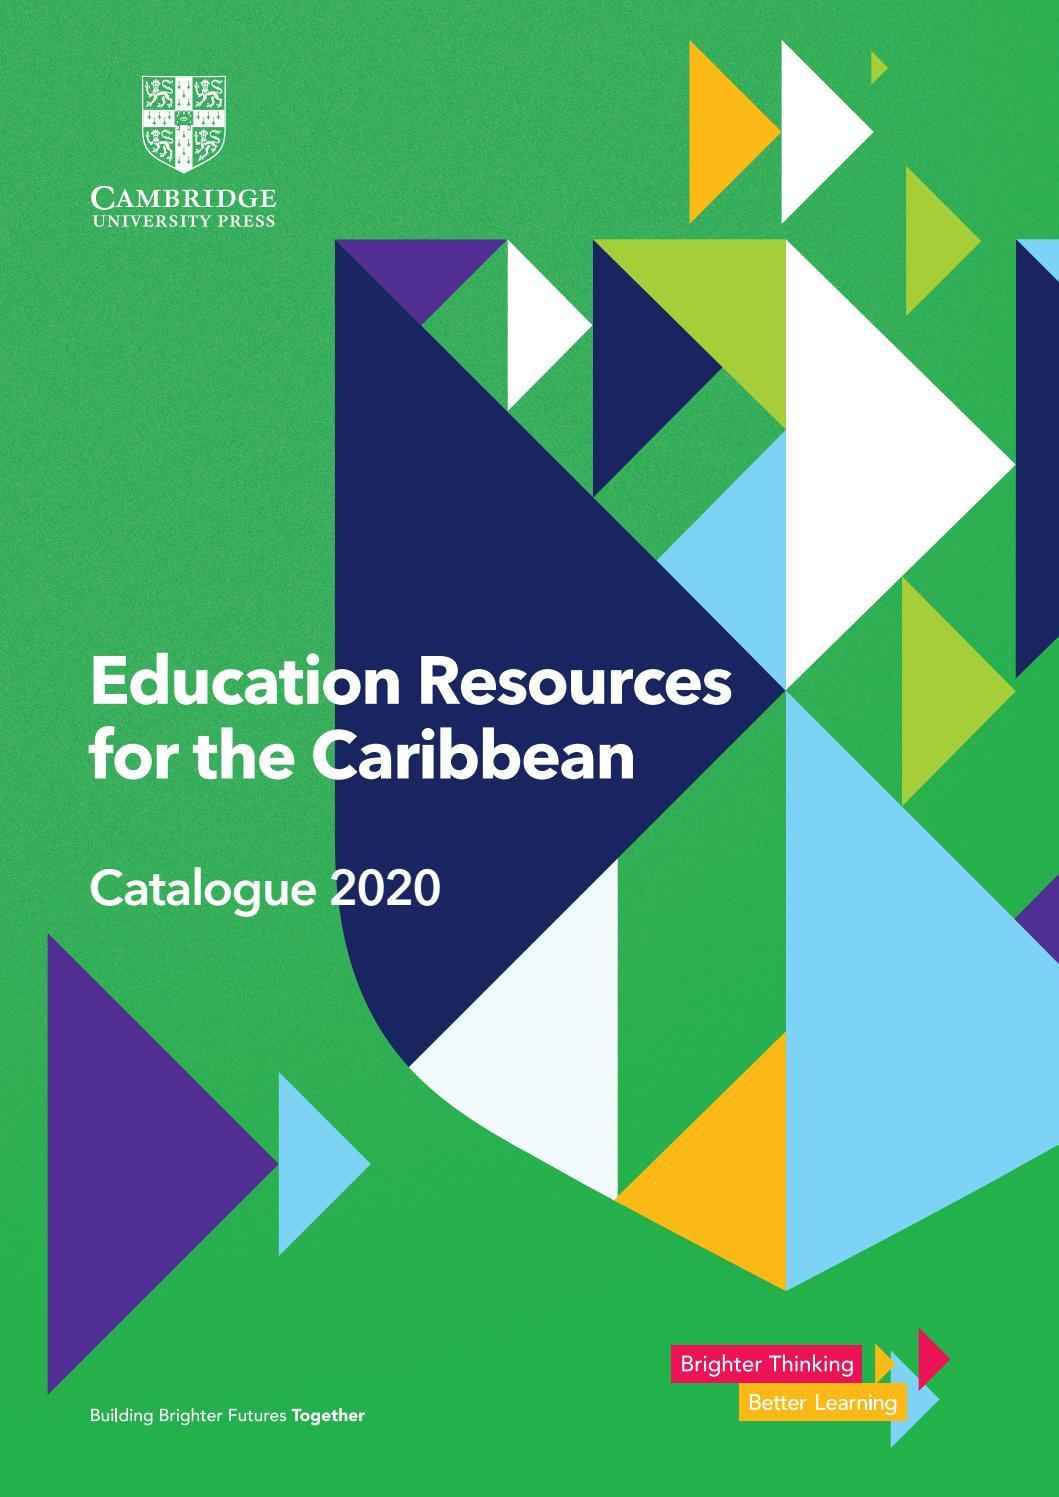 Caribbean Catalogue 2020 By Cambridge University Press